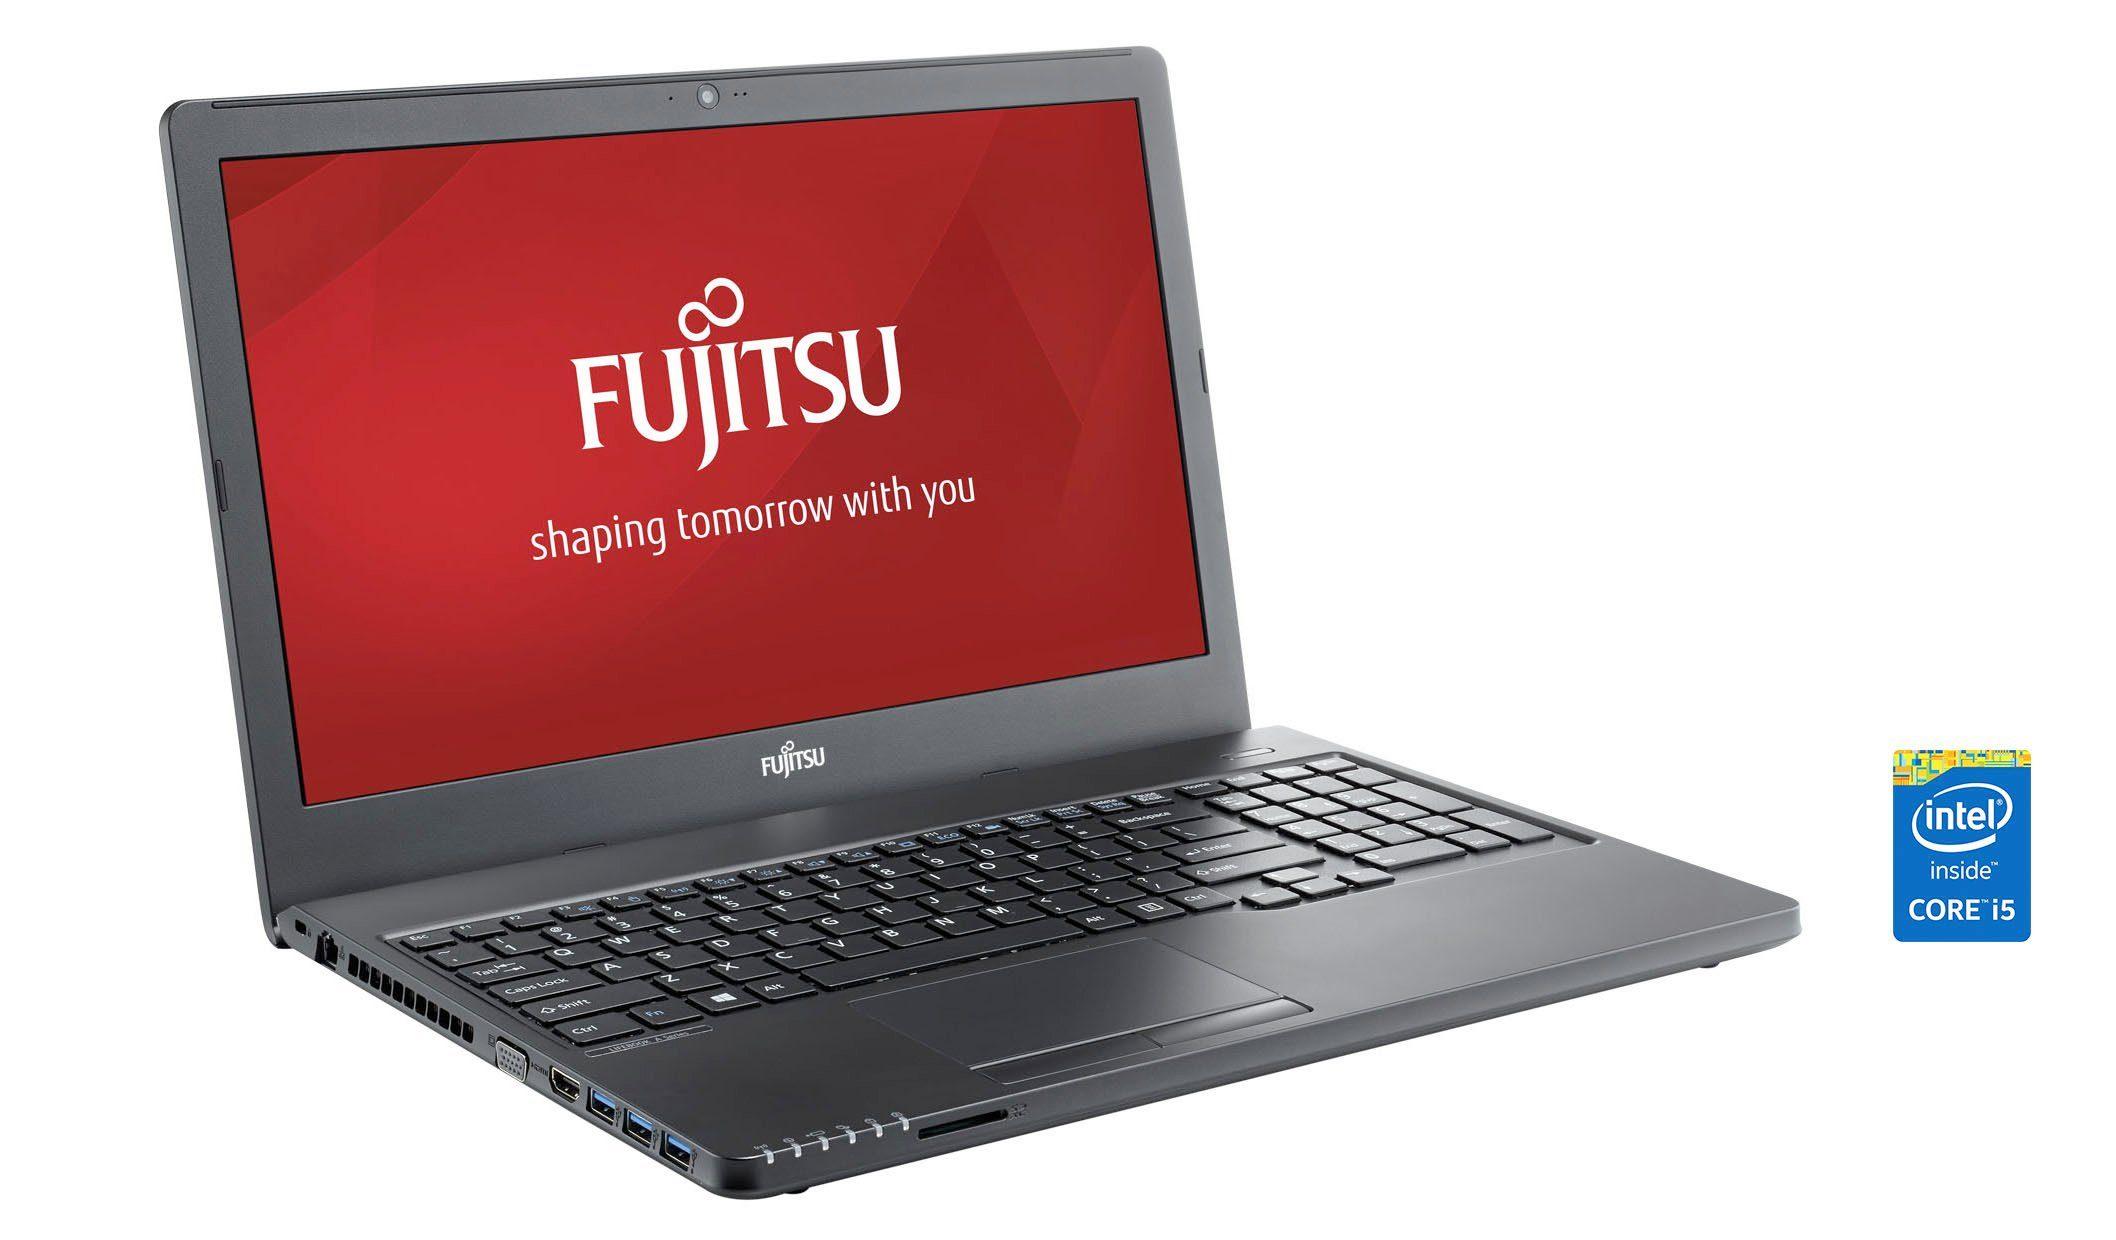 Fujitsu Business & Professional »LIFEBOOK A357 15 FHD I5-7200U«